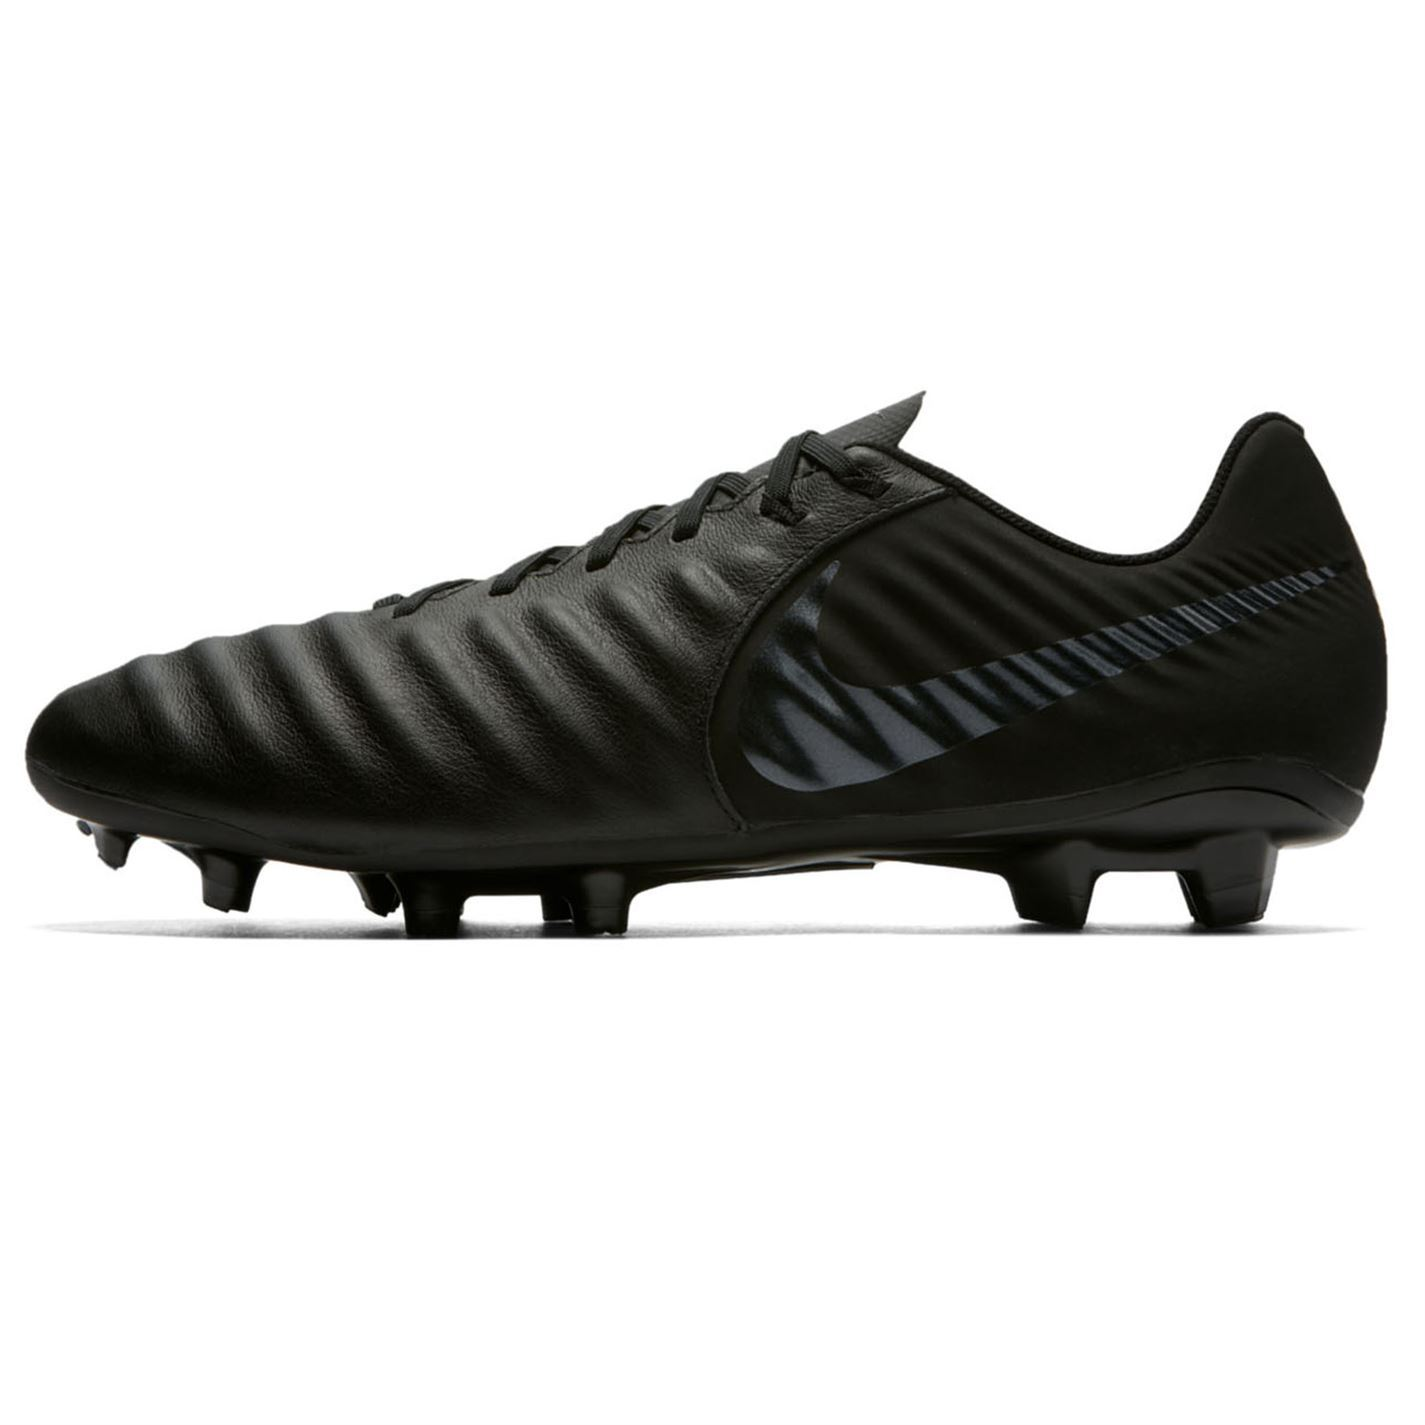 Nike-Tiempo-Legend-Academy-FG-Firm-Ground-Chaussures-De-Football-Homme-Football-Chaussures-Crampons miniature 12